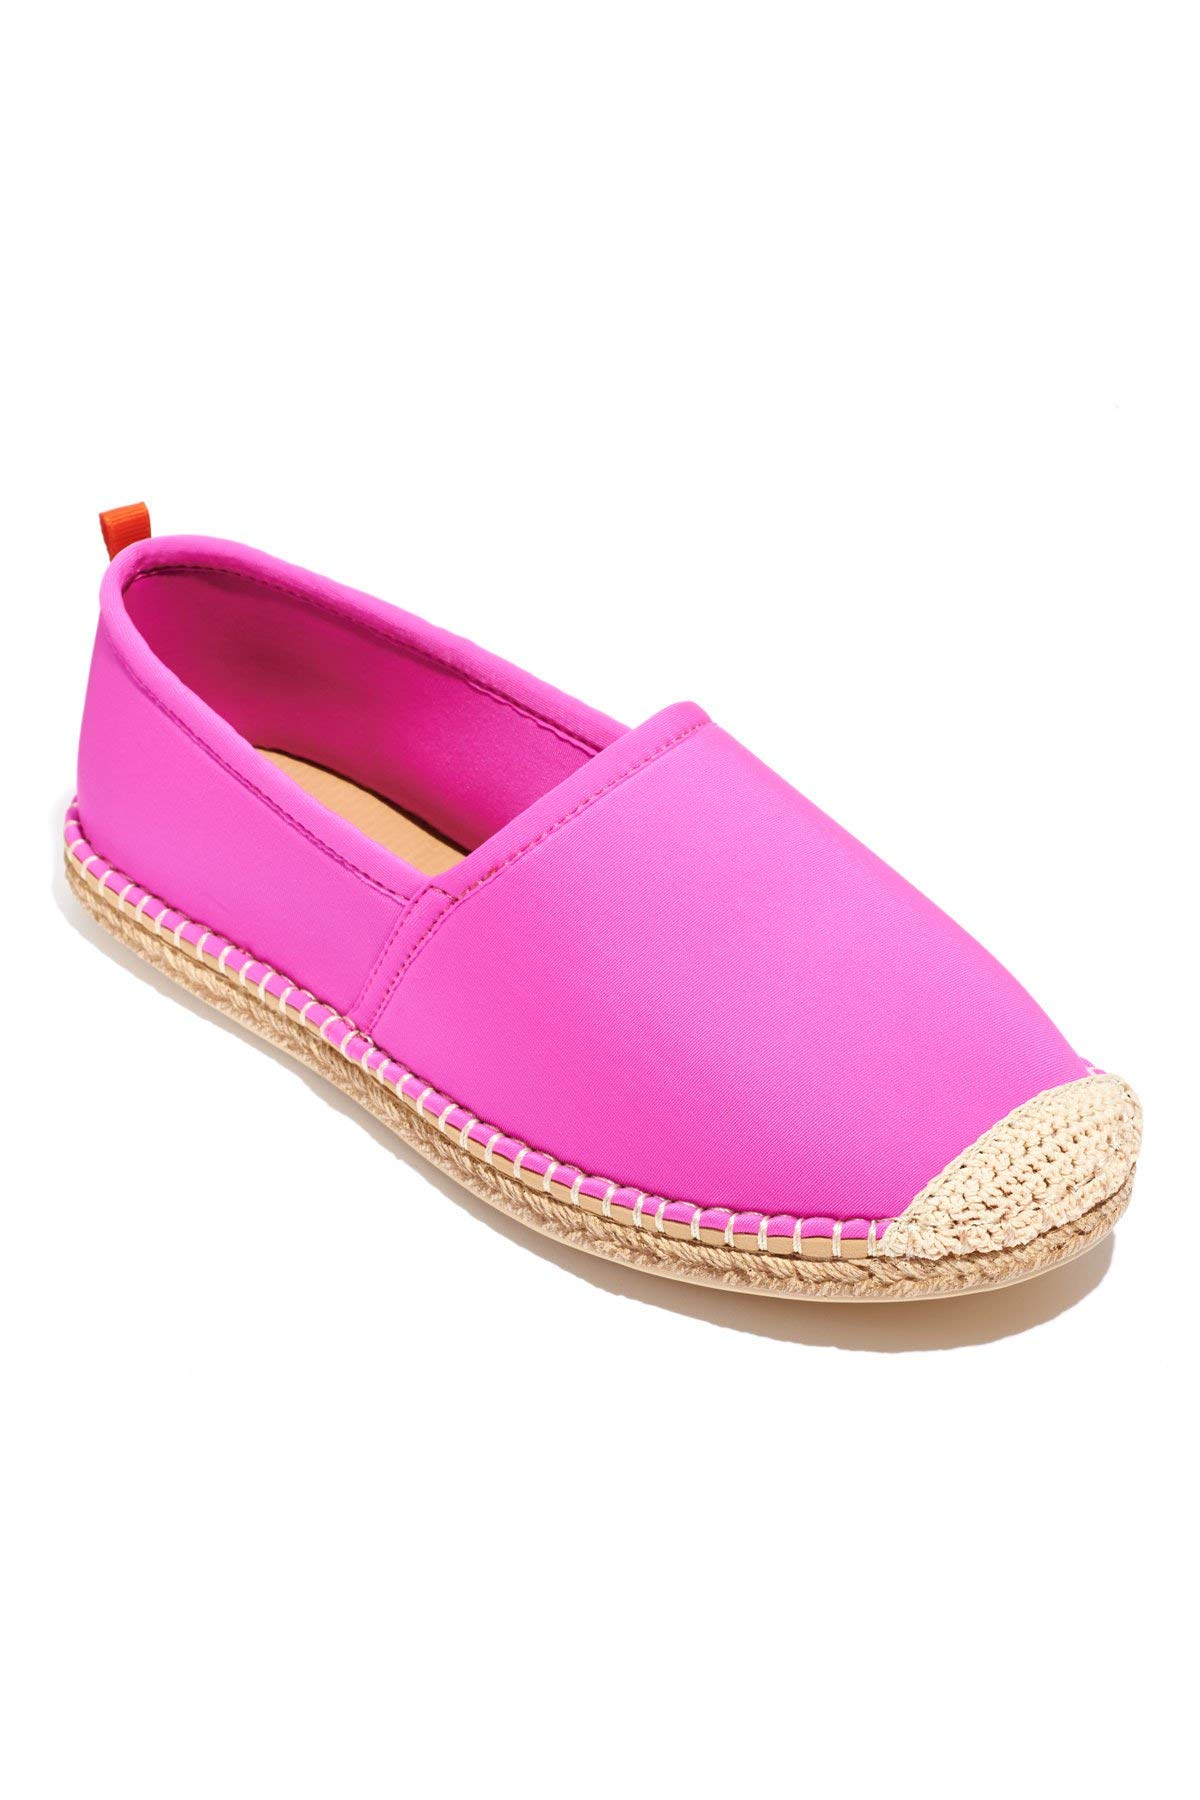 Sea Star Beachwear Women's Neoprene Beachcomber Espadrille Flat, Water-Friendly and Quick Drying Hot Pink 6